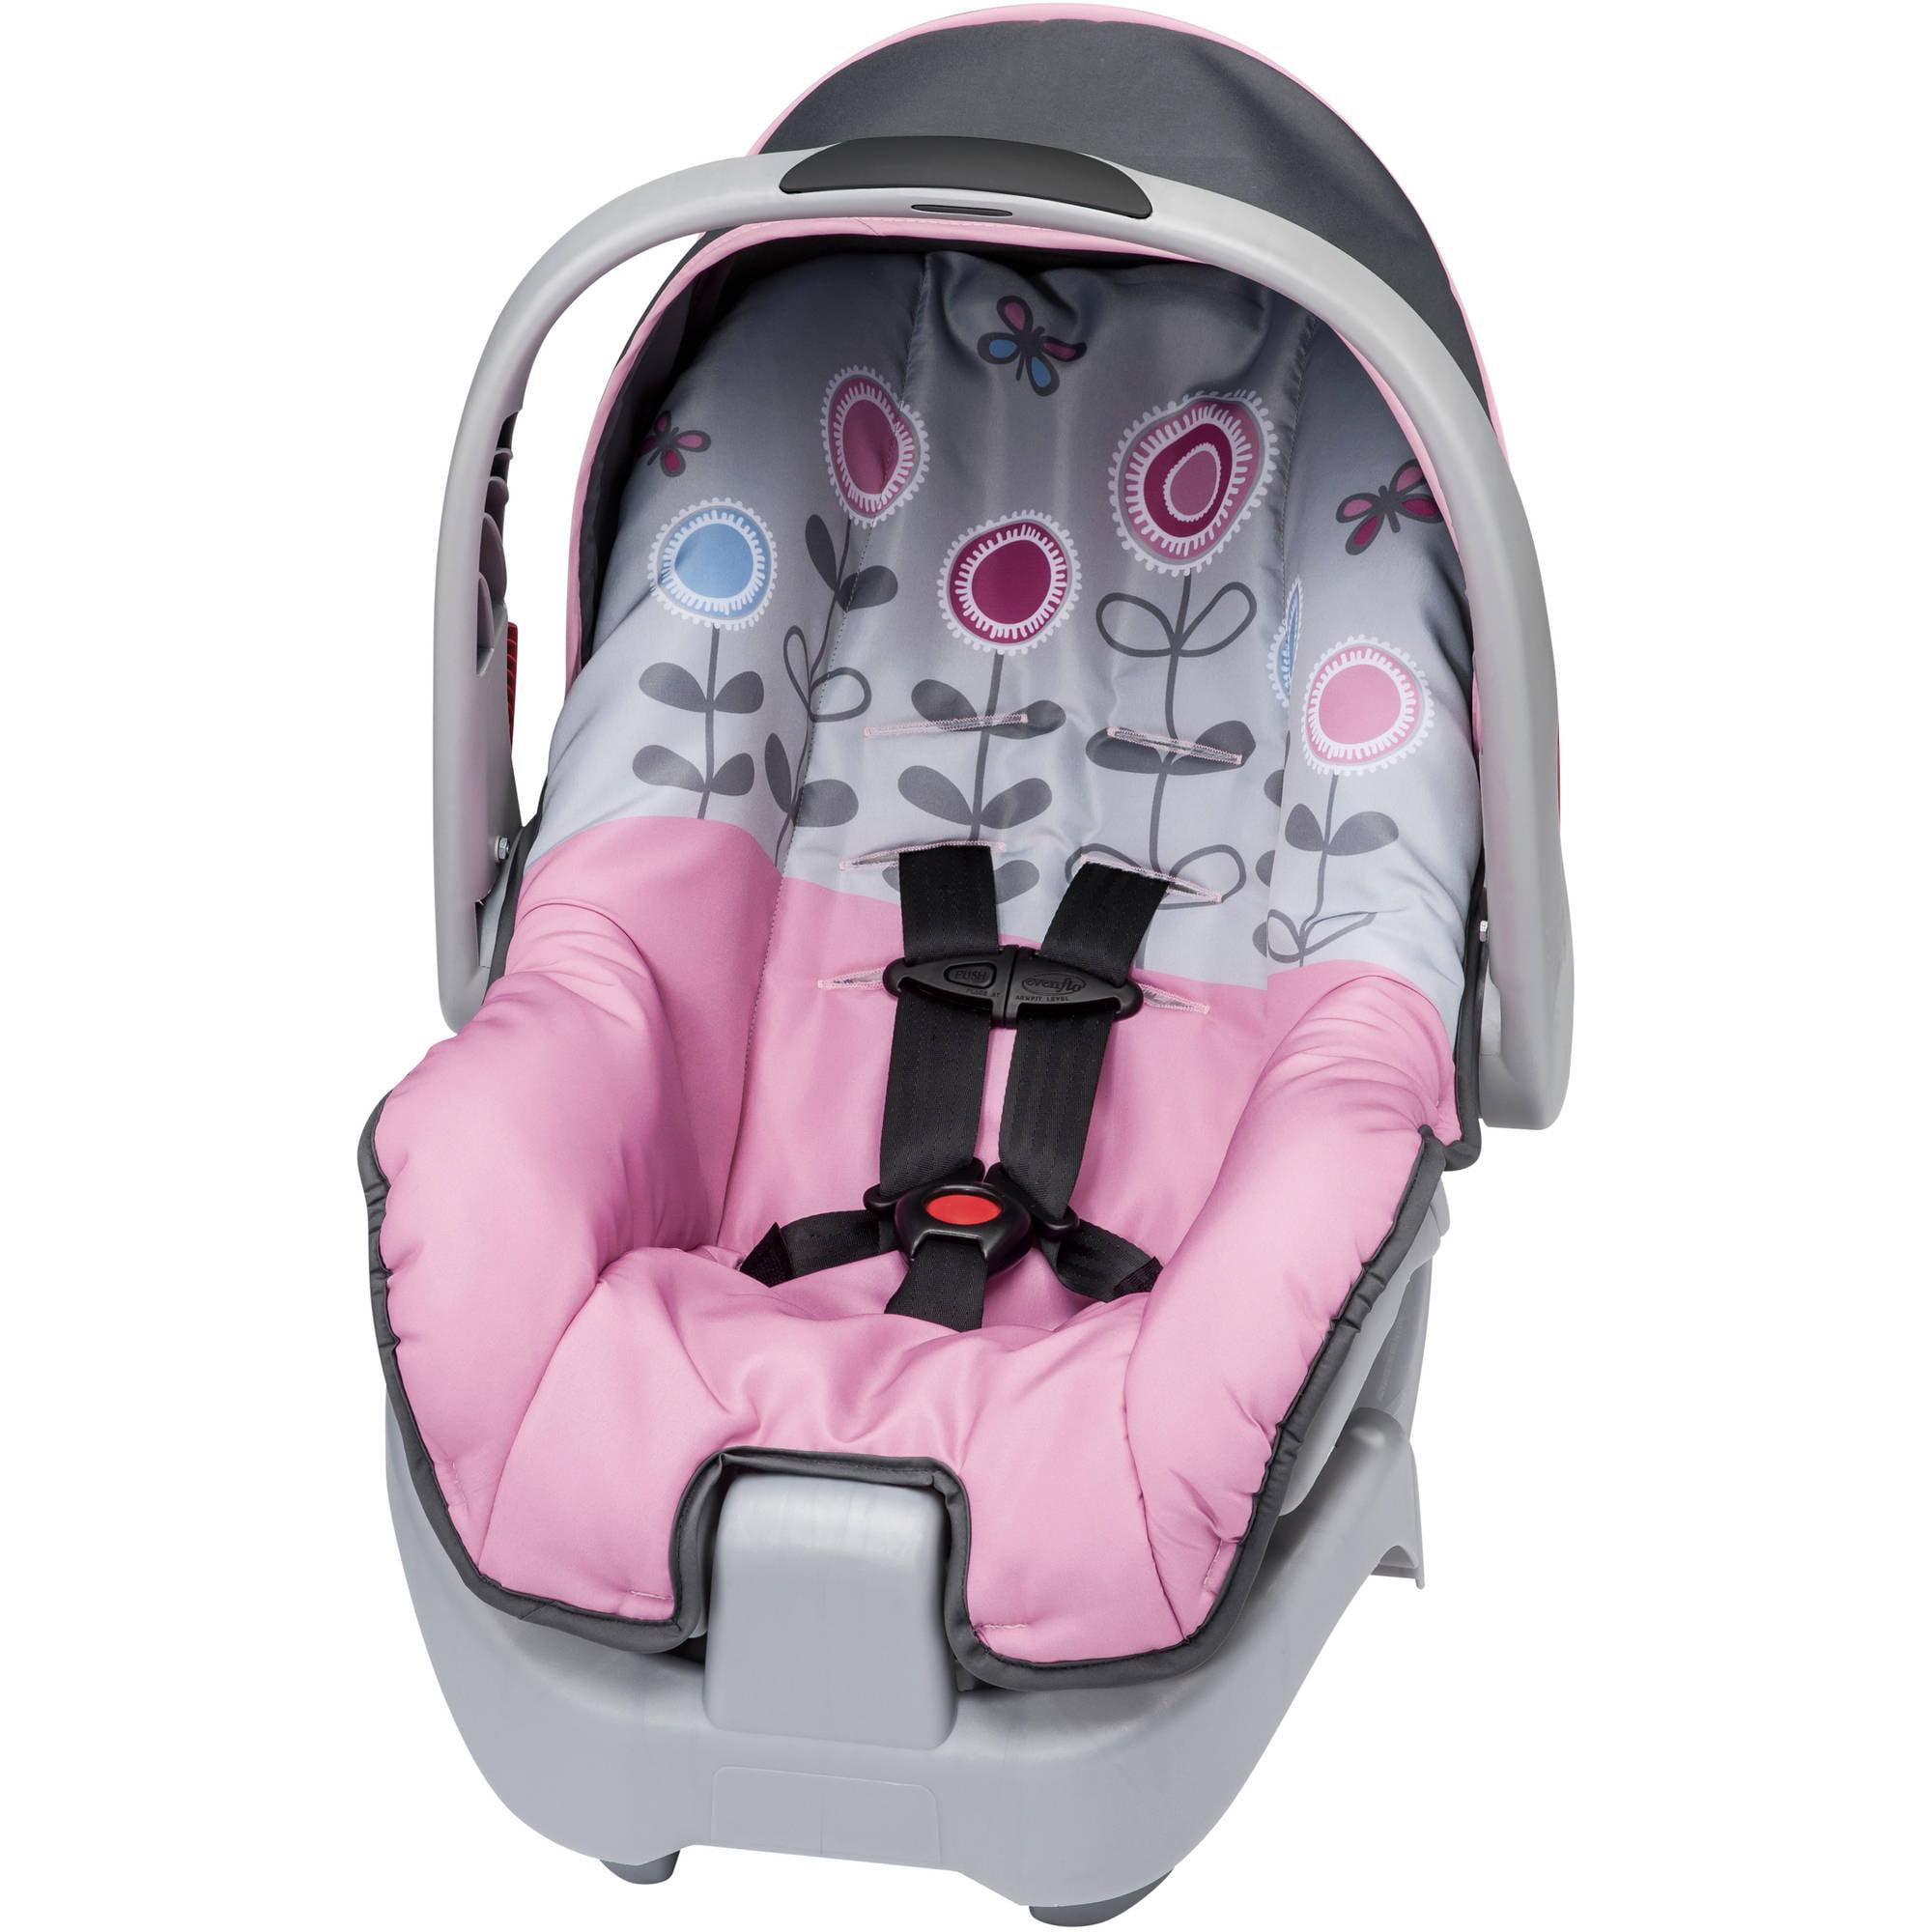 Evenflo Nurture Infant Car Seat, on - Walmart.com